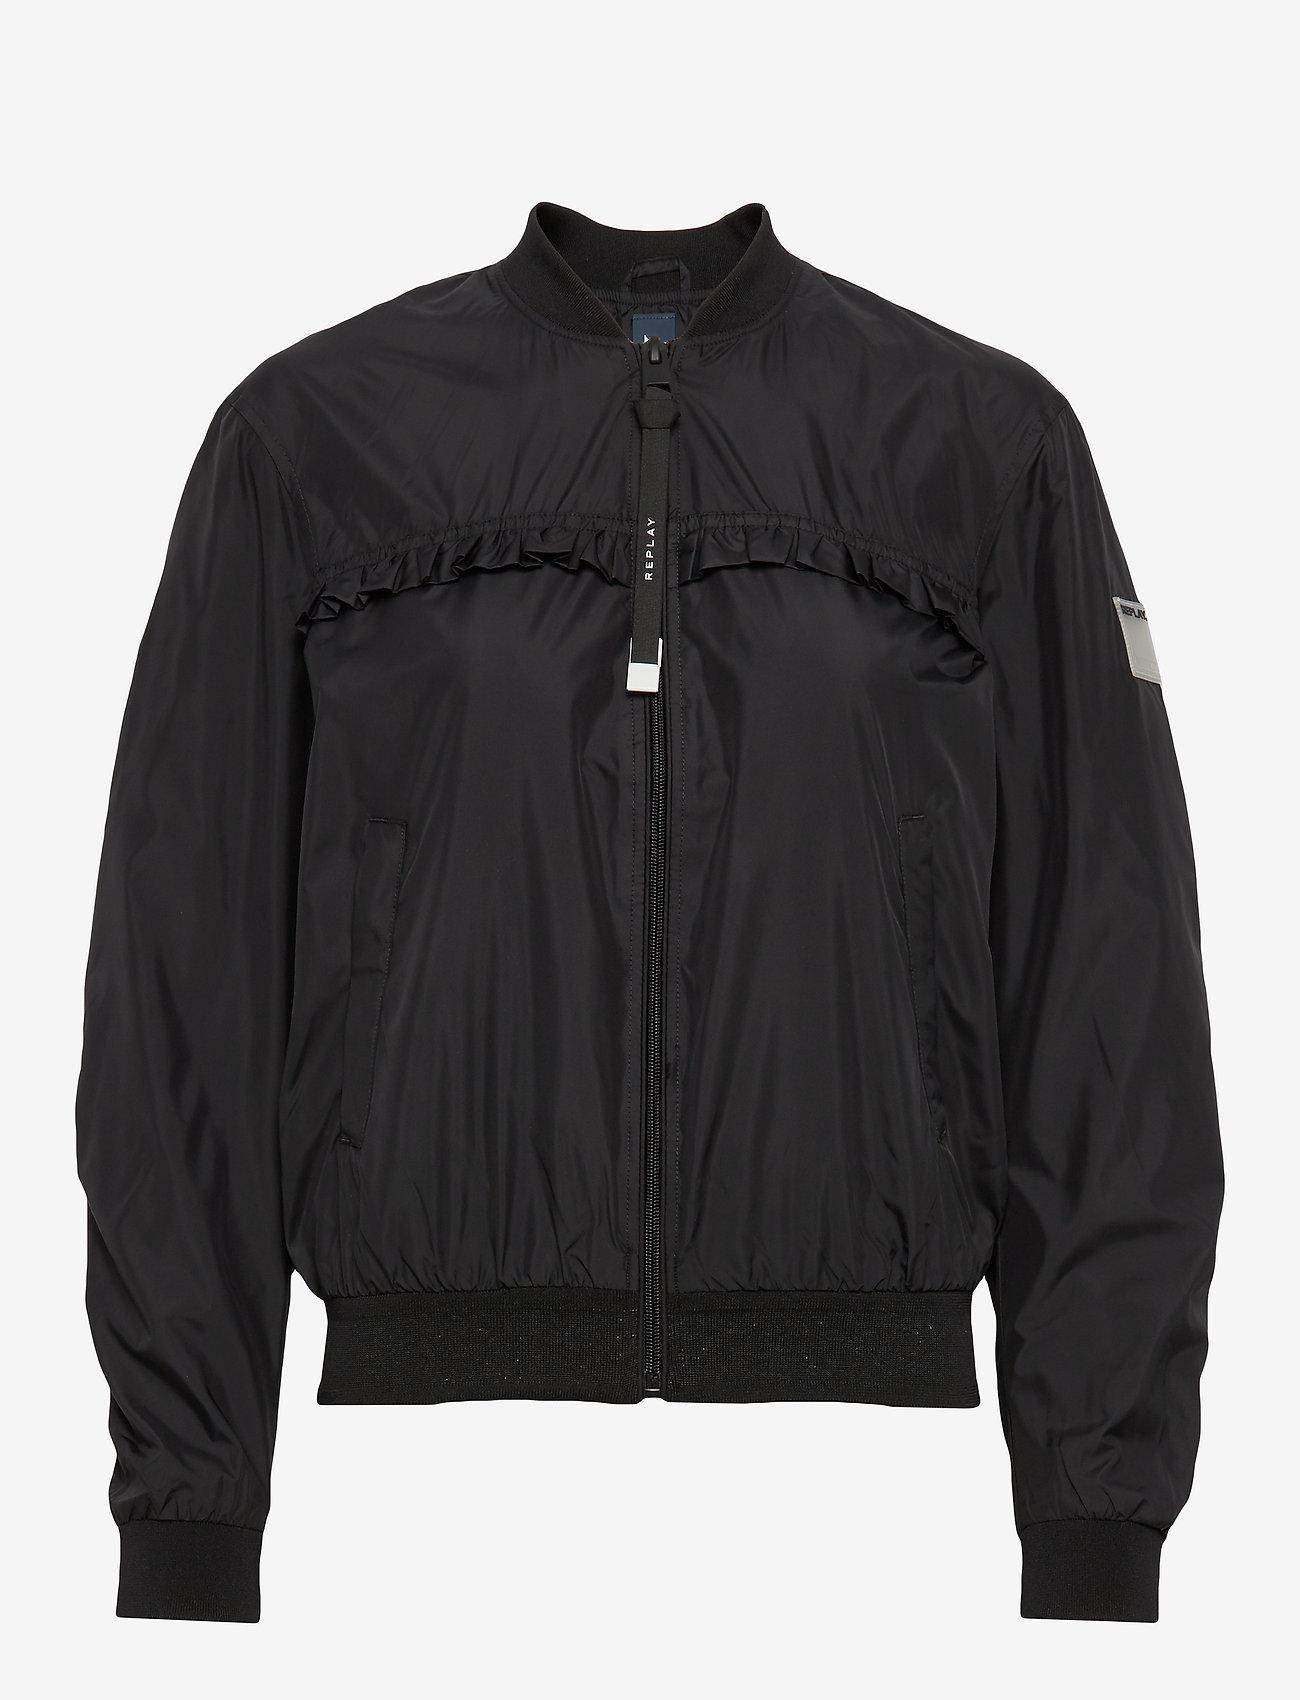 Replay - Jacket - bomber jakker - black - 0